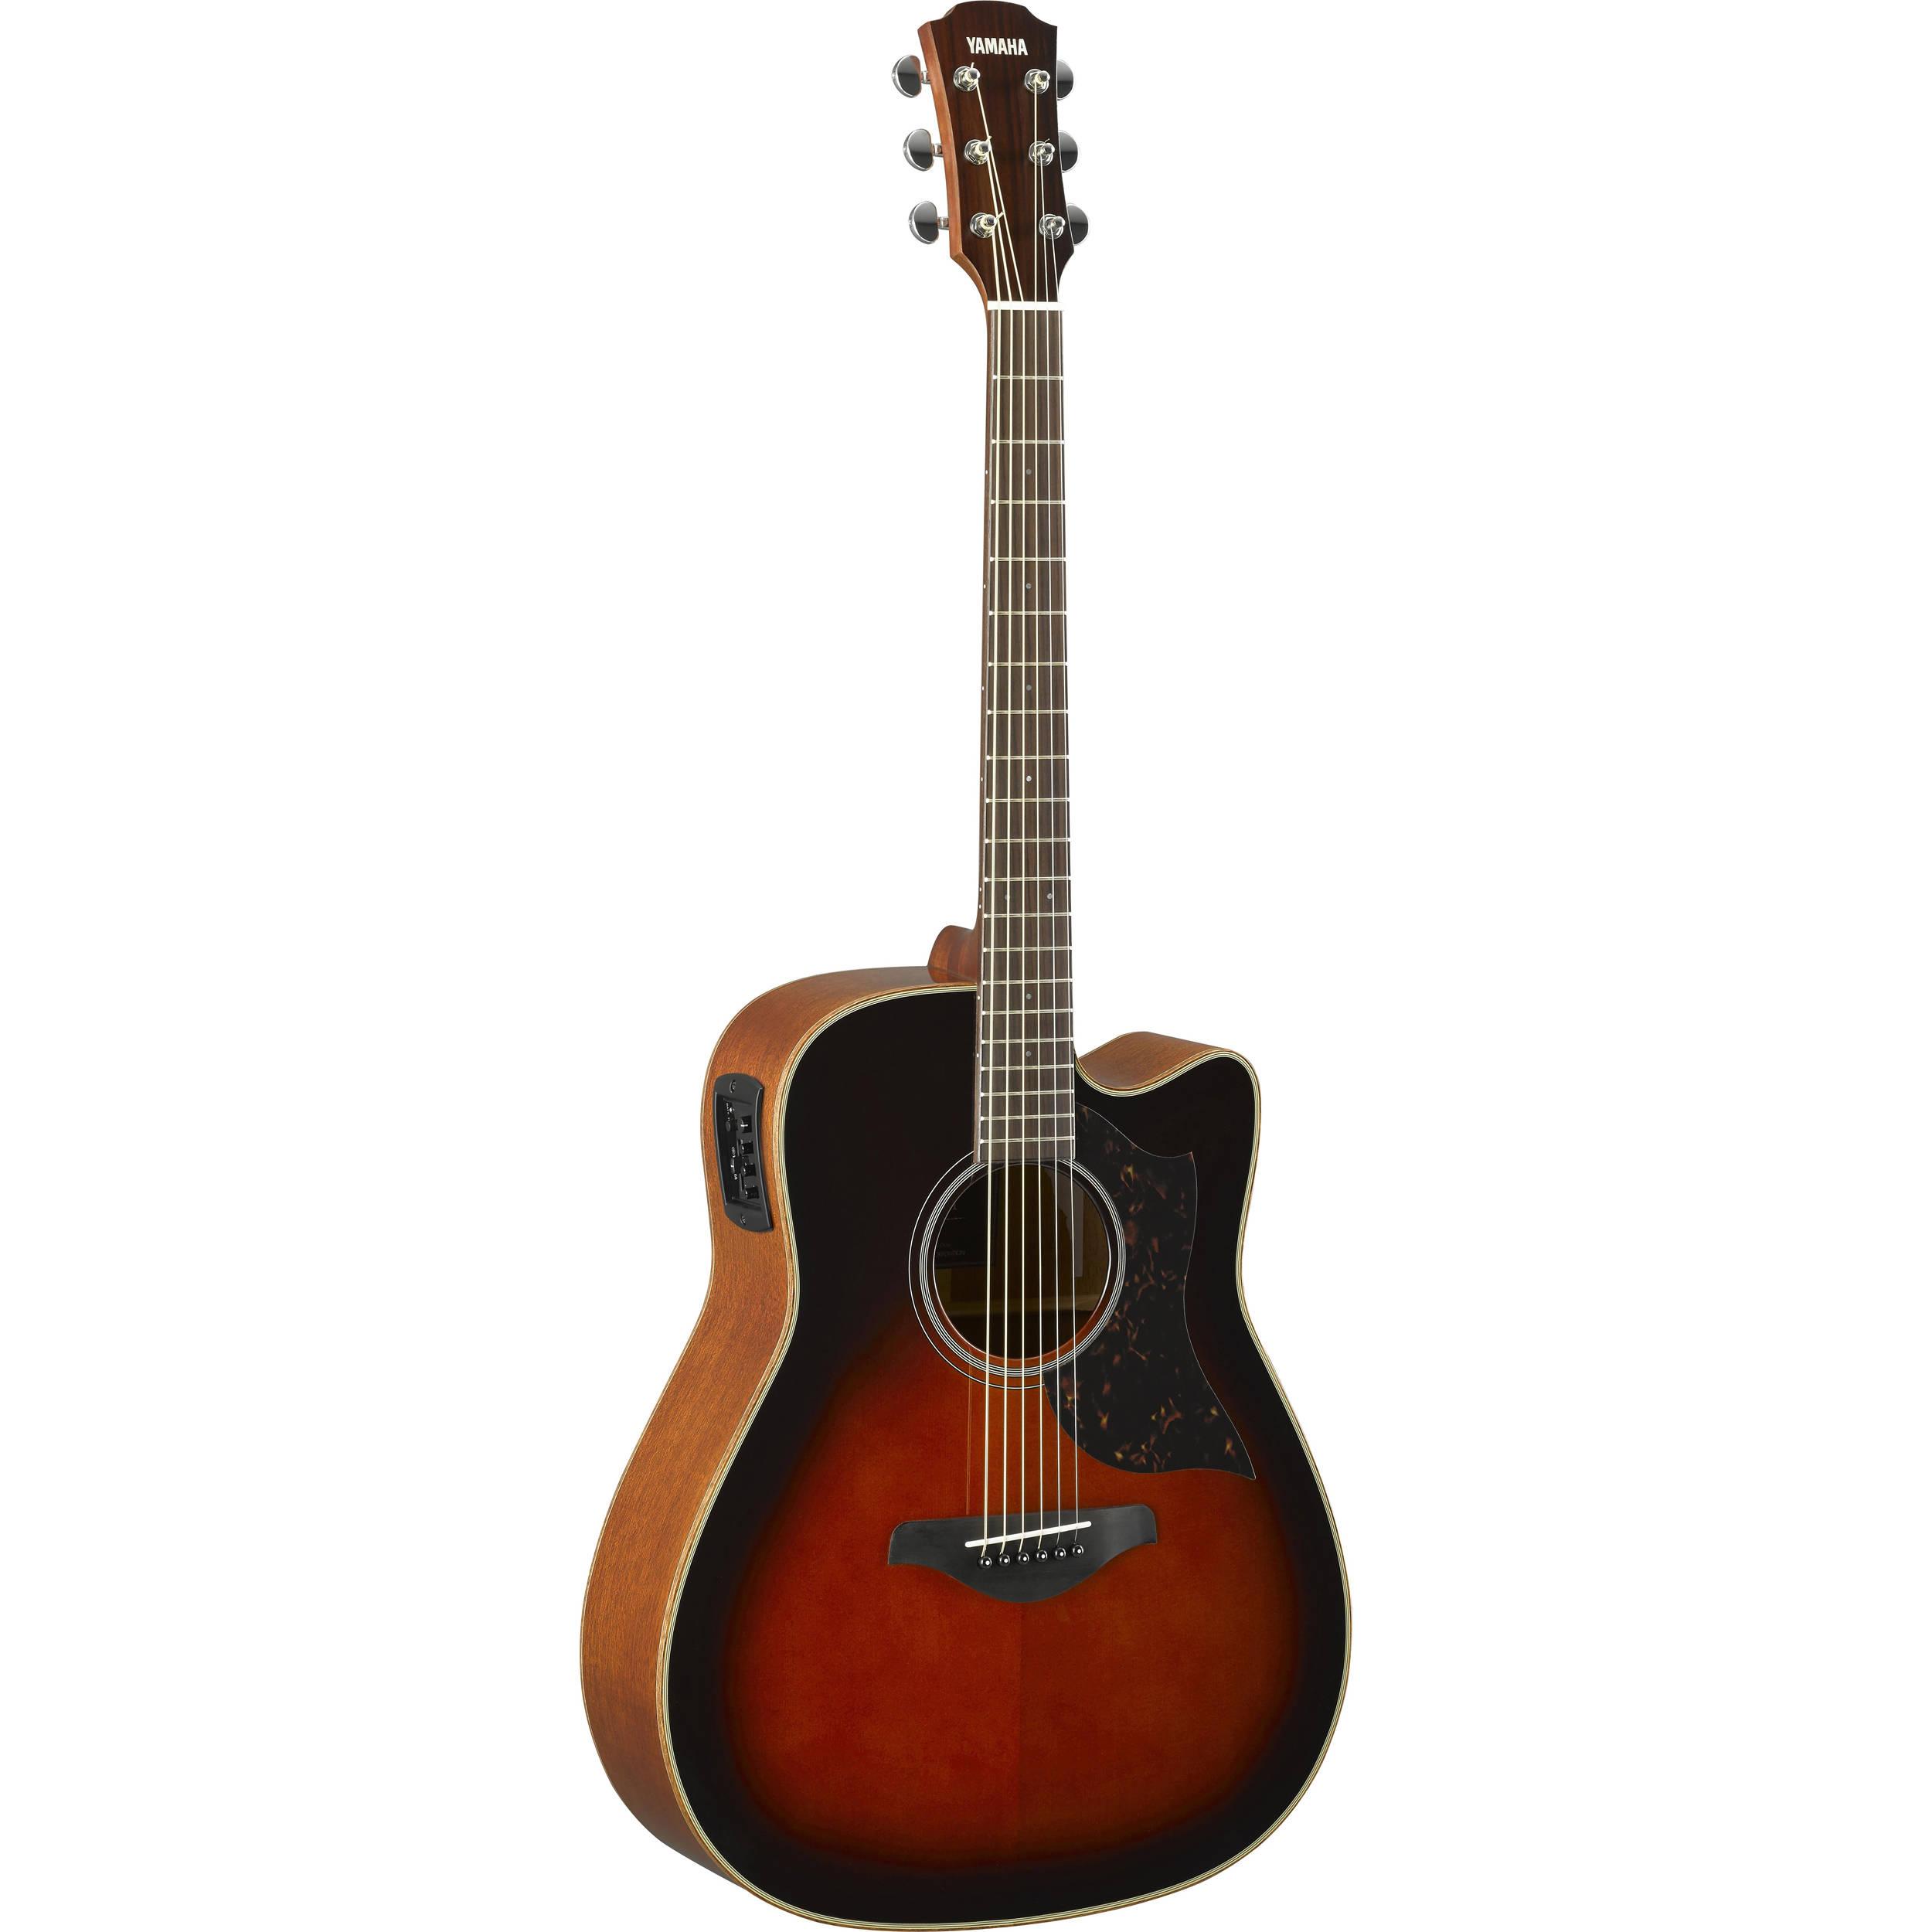 yamaha a1m western acoustic electric cutaway guitar a1m tbs b h. Black Bedroom Furniture Sets. Home Design Ideas